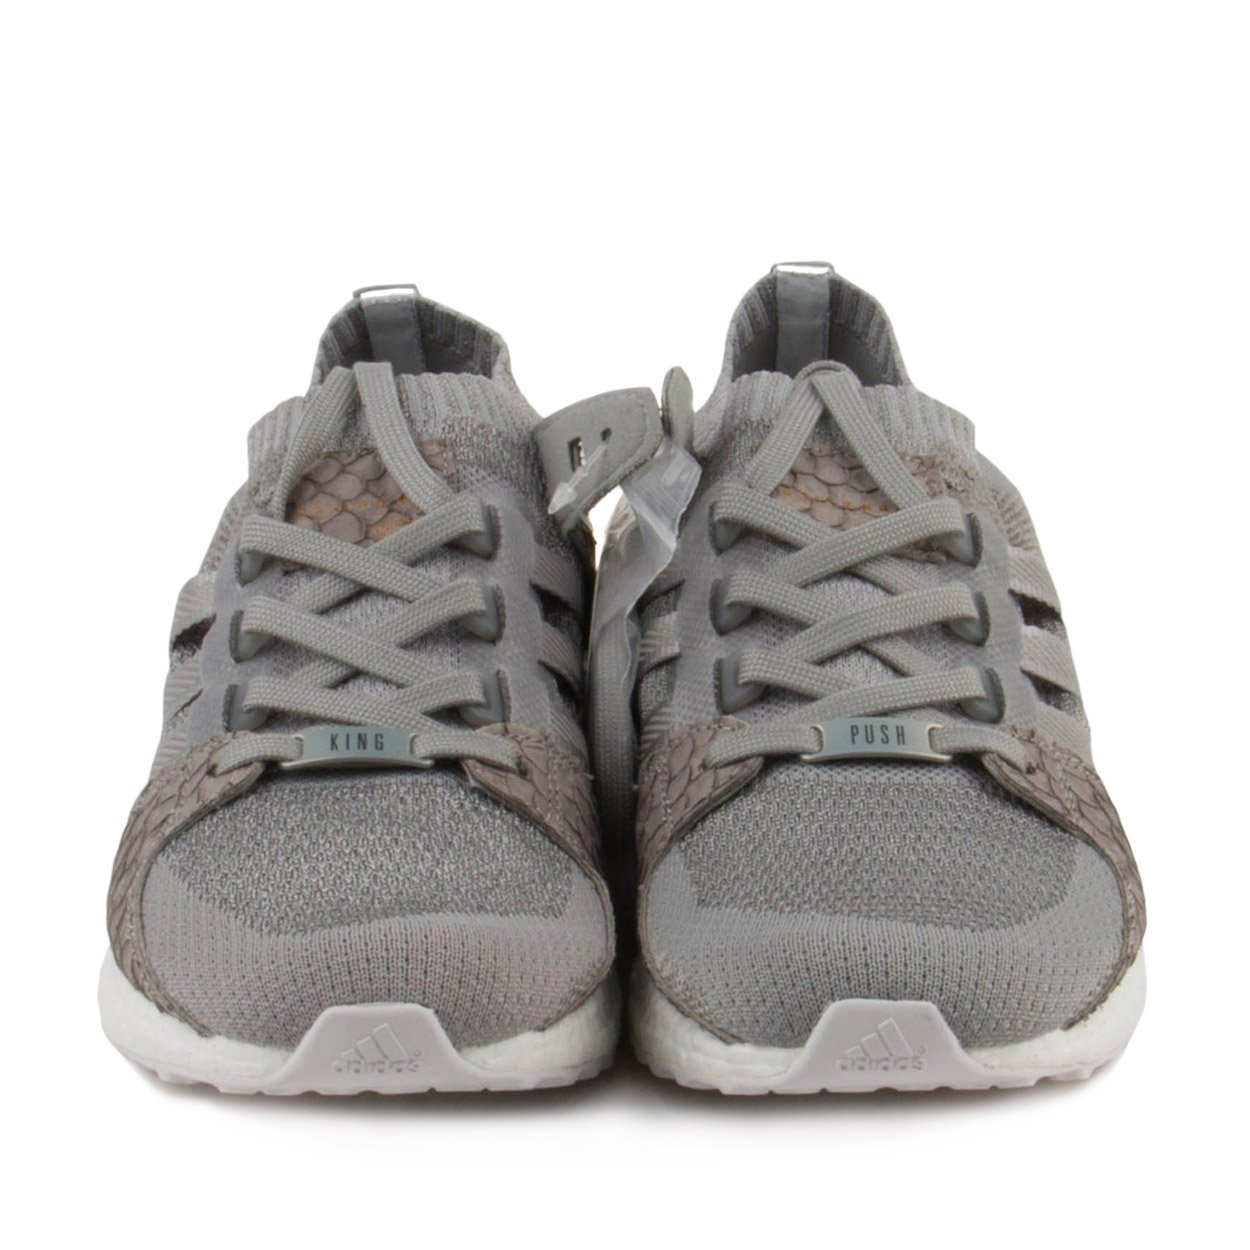 adidas EQT Support Ultra 8.5 Primeknit 8.5 Ultra D(M) US|Stone/Stone/Stone B01N2S79G0 9f8a1a